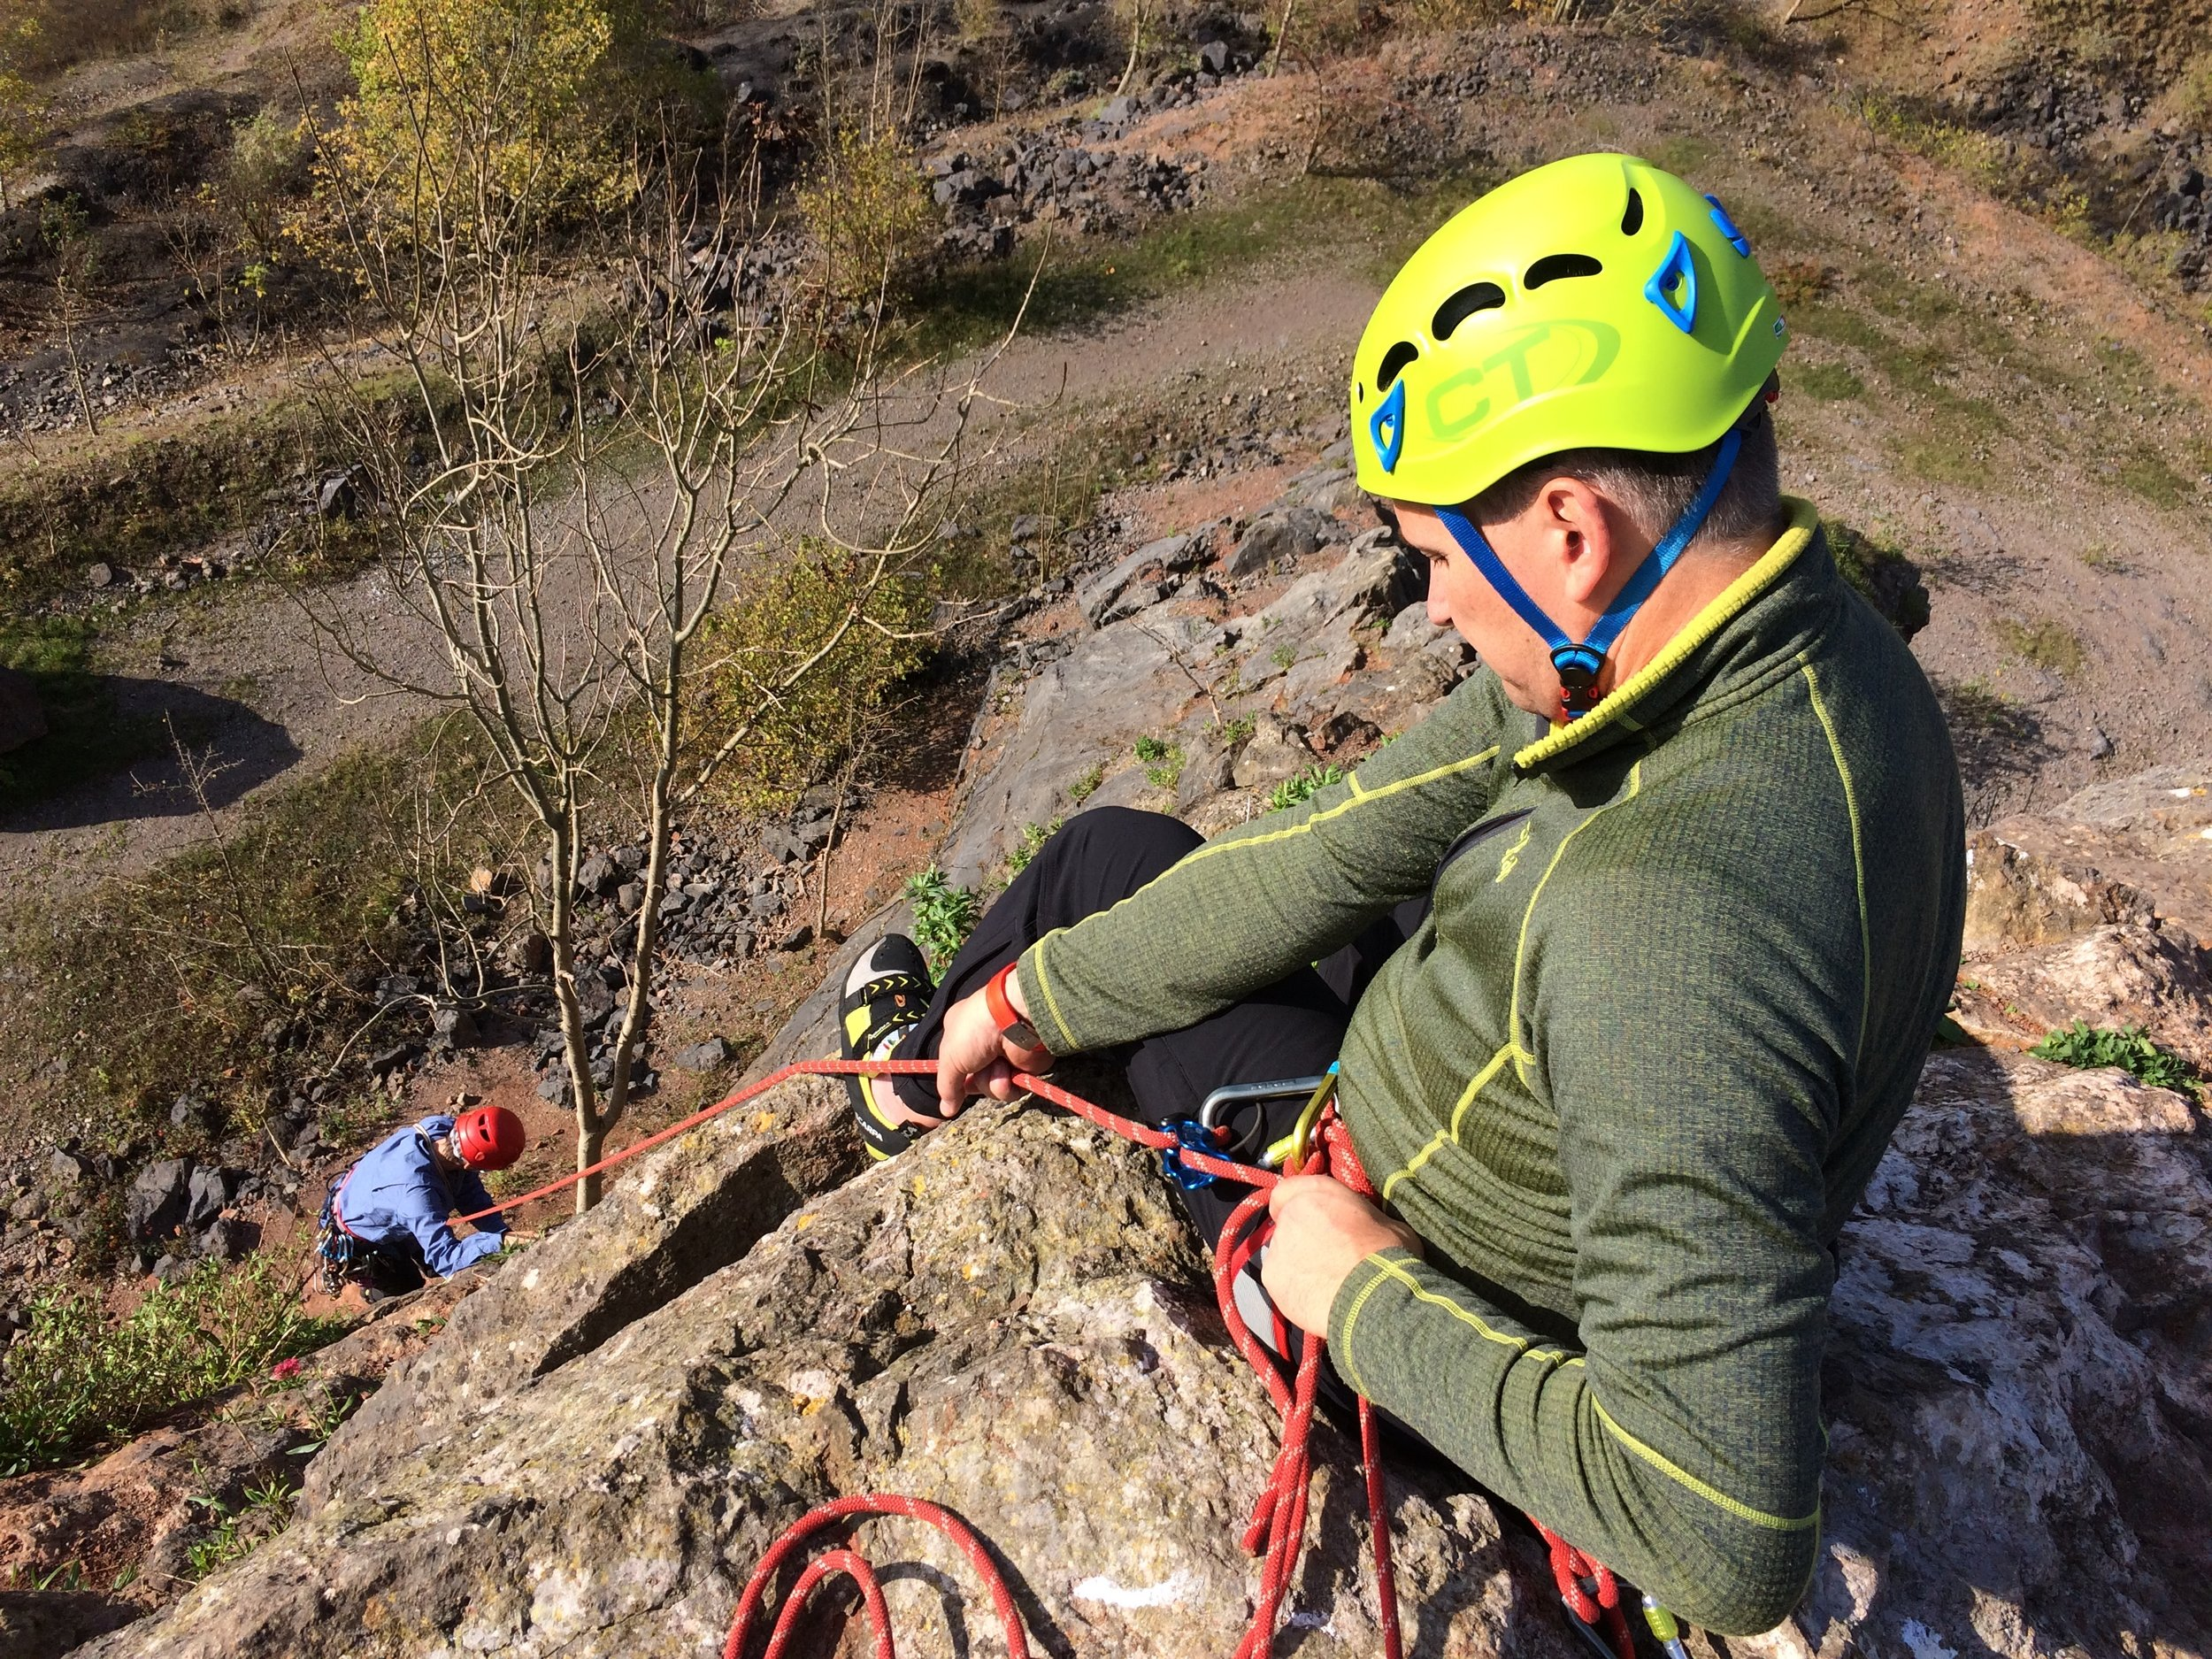 Bespoke Climbing Instruction    Learn More